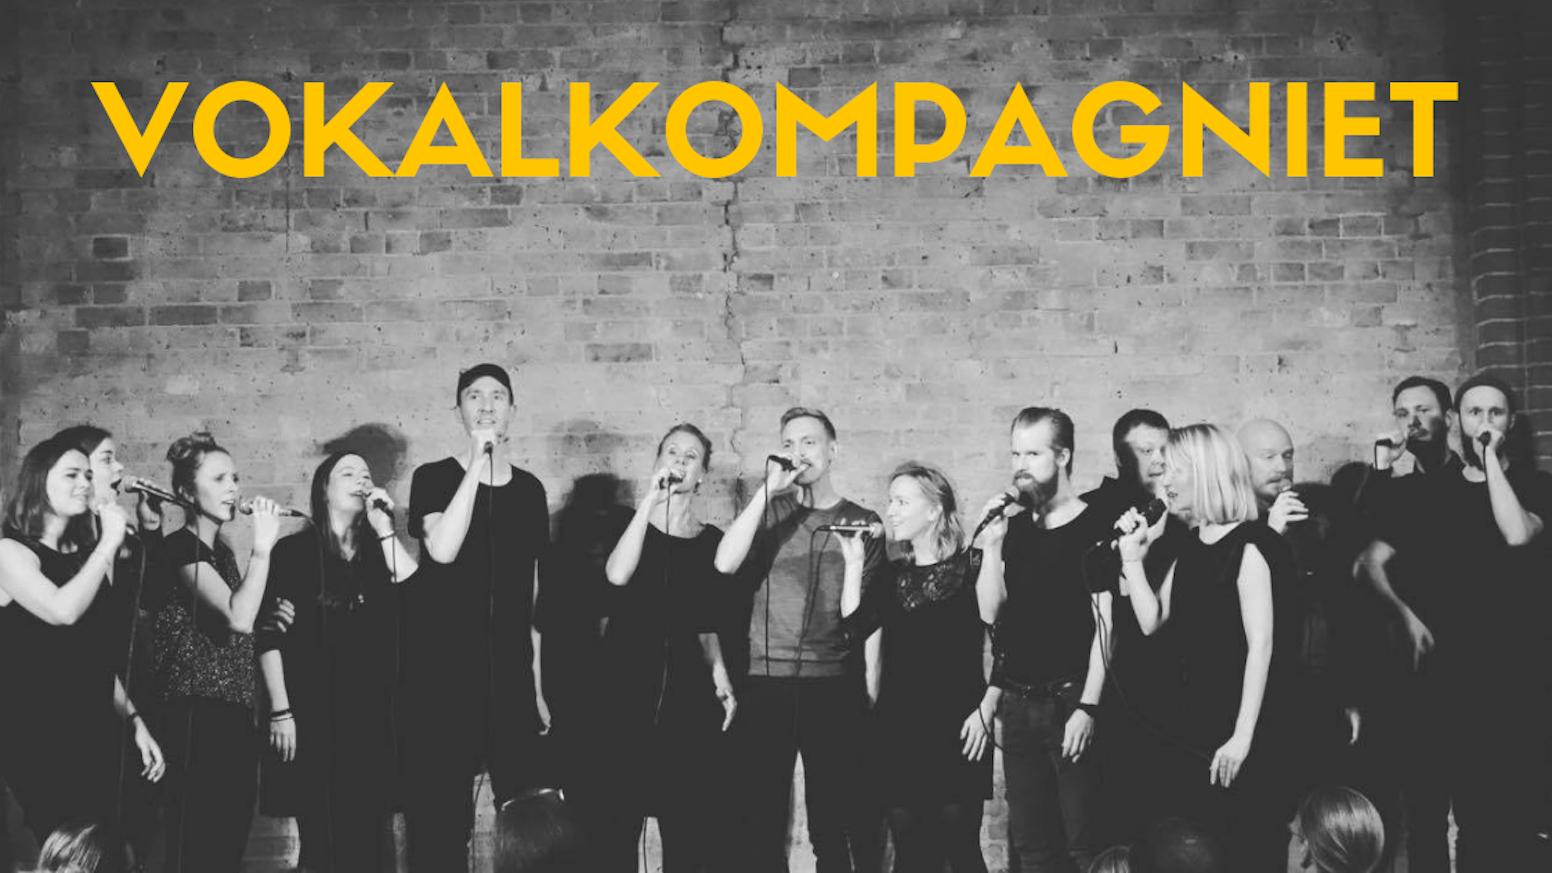 A CAPPELLA ALBUM - Vokalkompagniet by Vokalkompagniet — Kickstarter